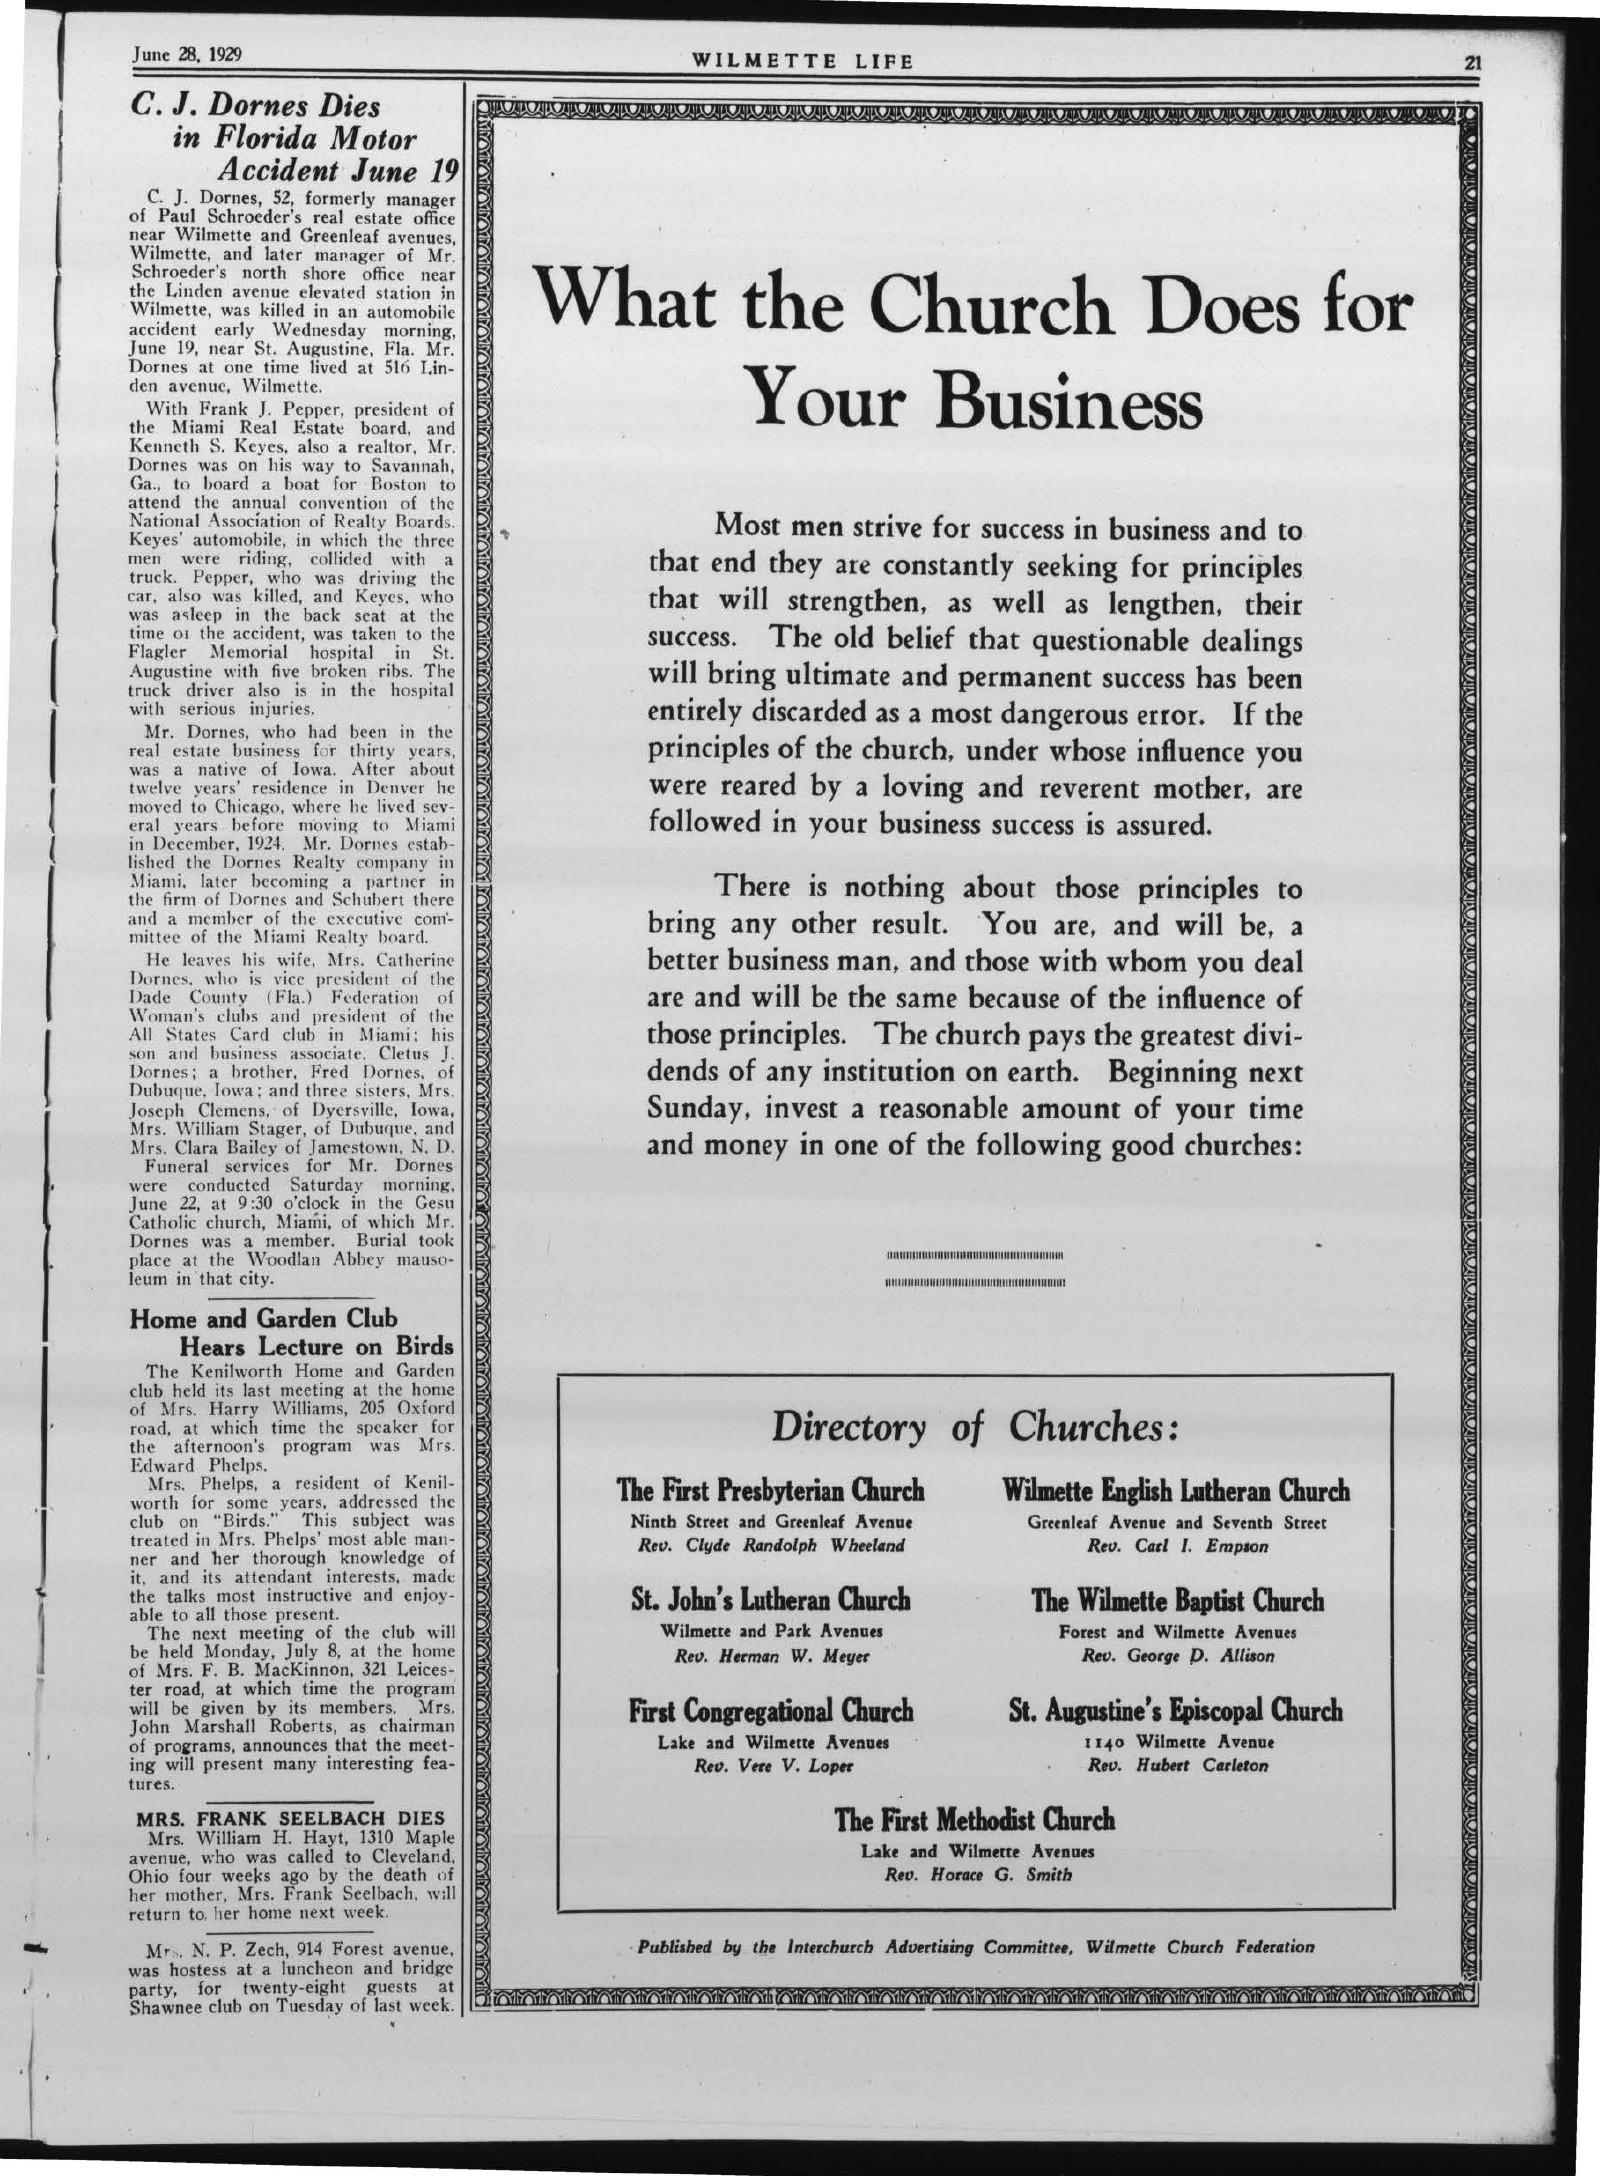 Wilmette Life (Wilmette, Illinois), 28 Jun 1929